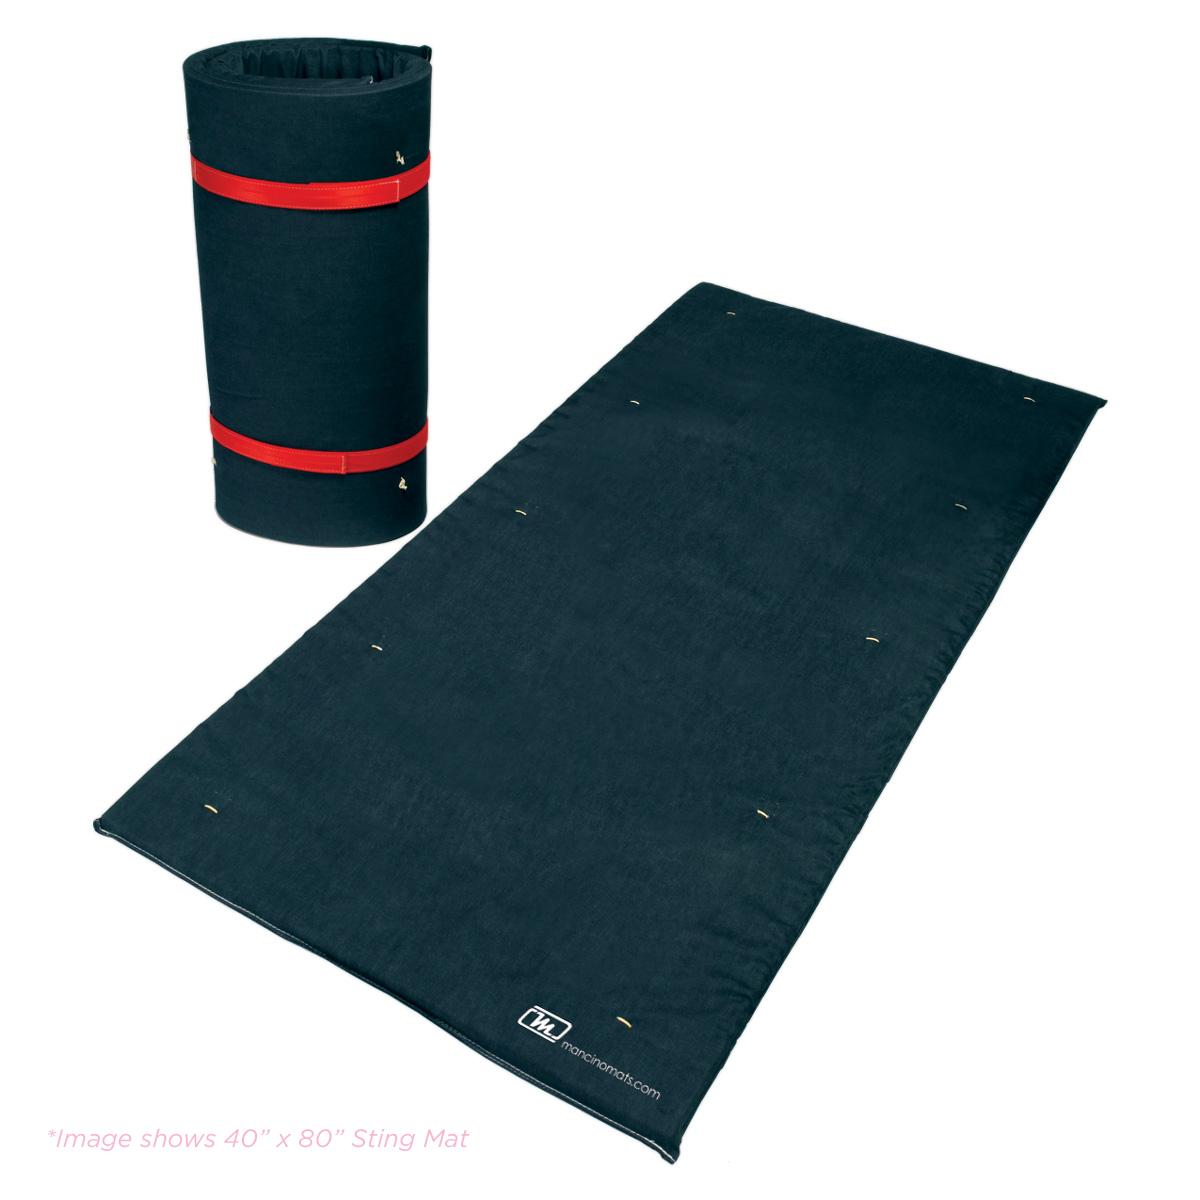 "Soft, Durable Denim Cover 2"" Thick Premium Foam Filler Tufting Ensures Filler Will Not Shift"